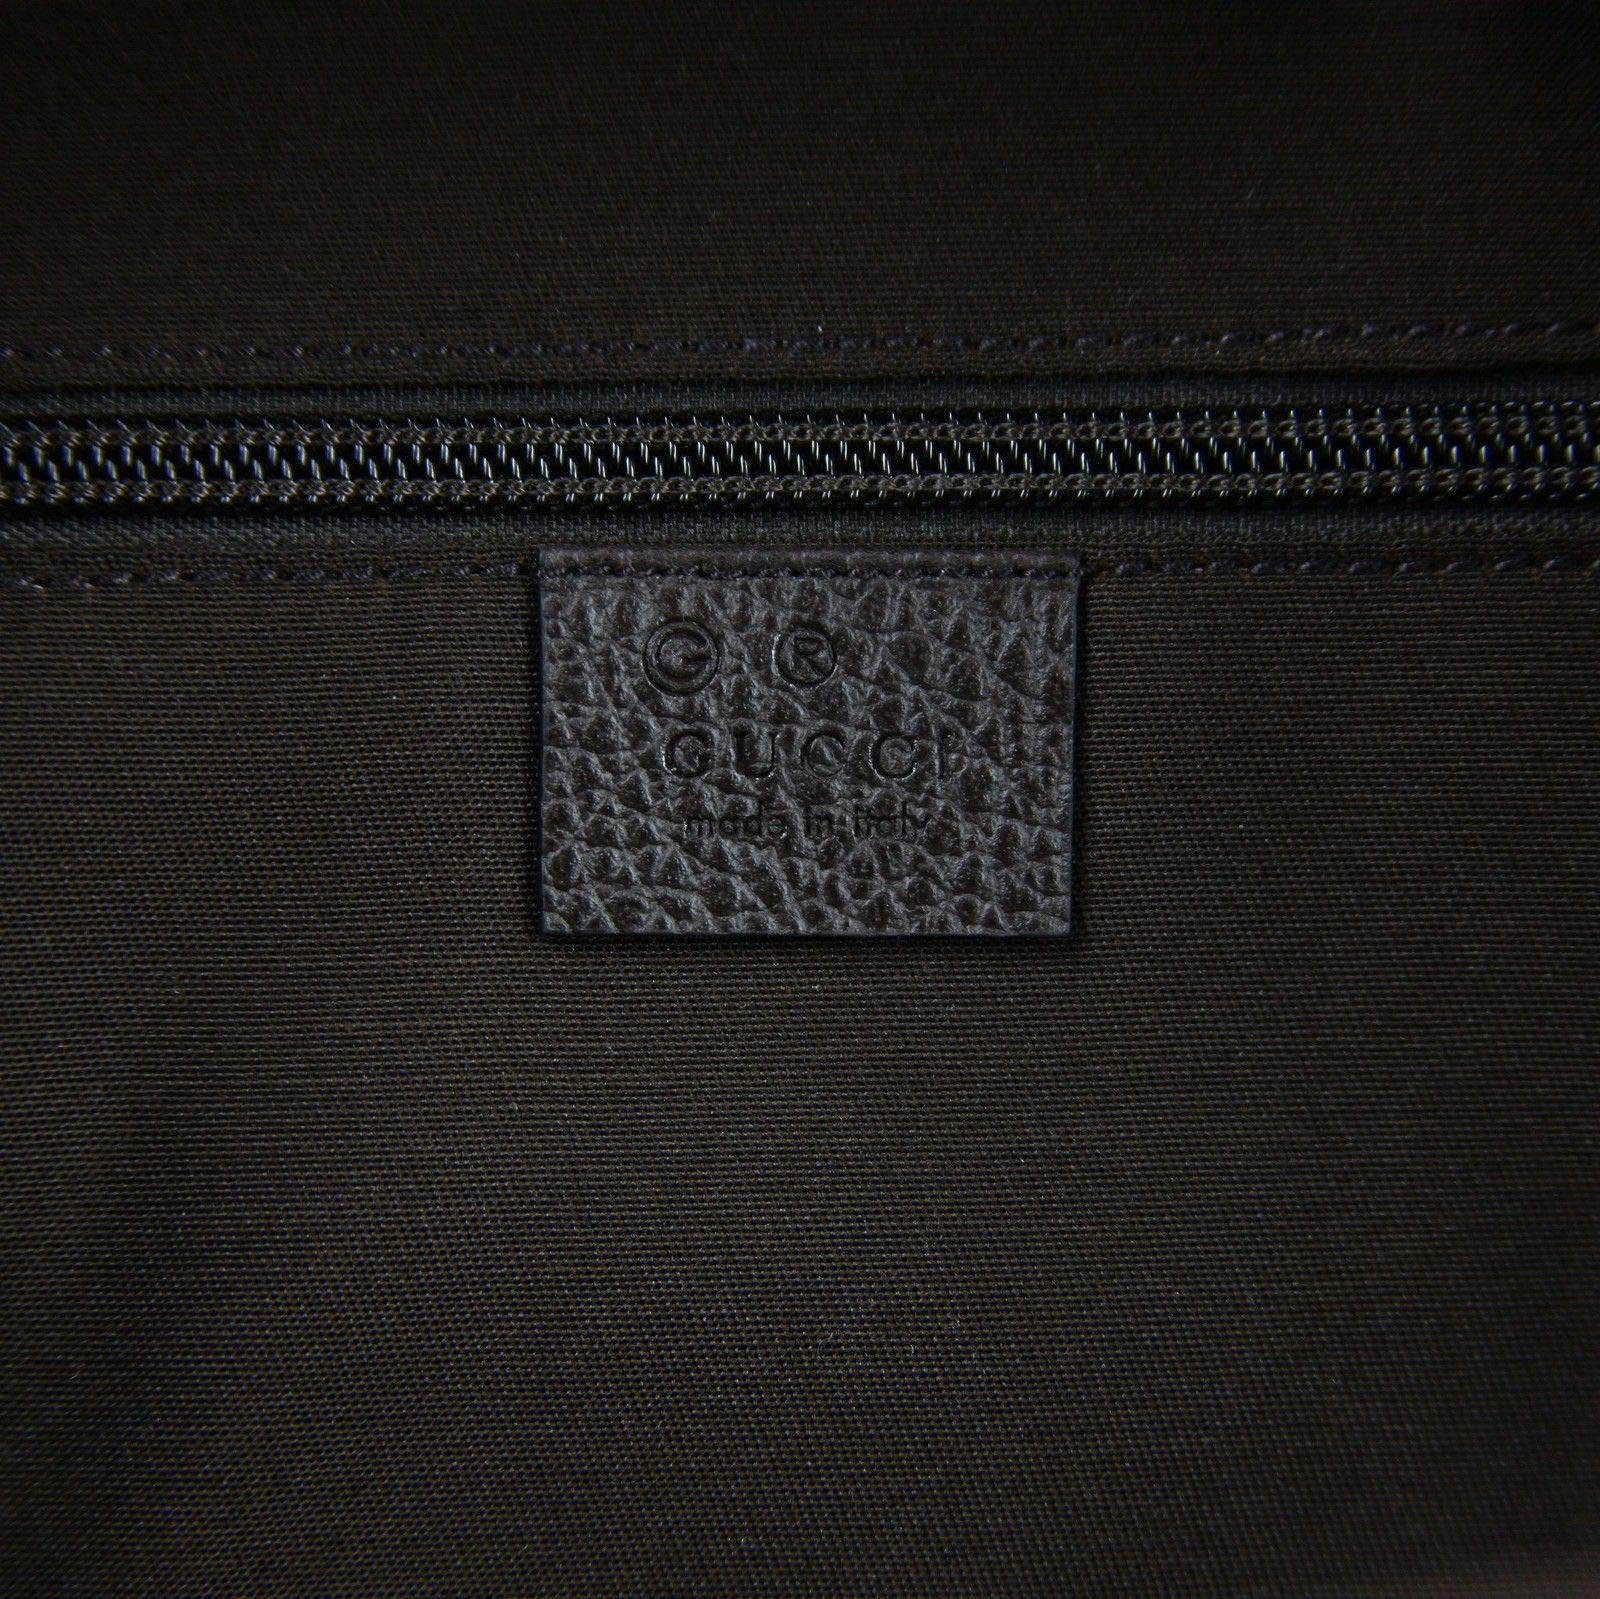 5d905ec70 Gucci Unisex Zipper Top Beige/Brown GG Canvas Backpack 449906 9873 ...